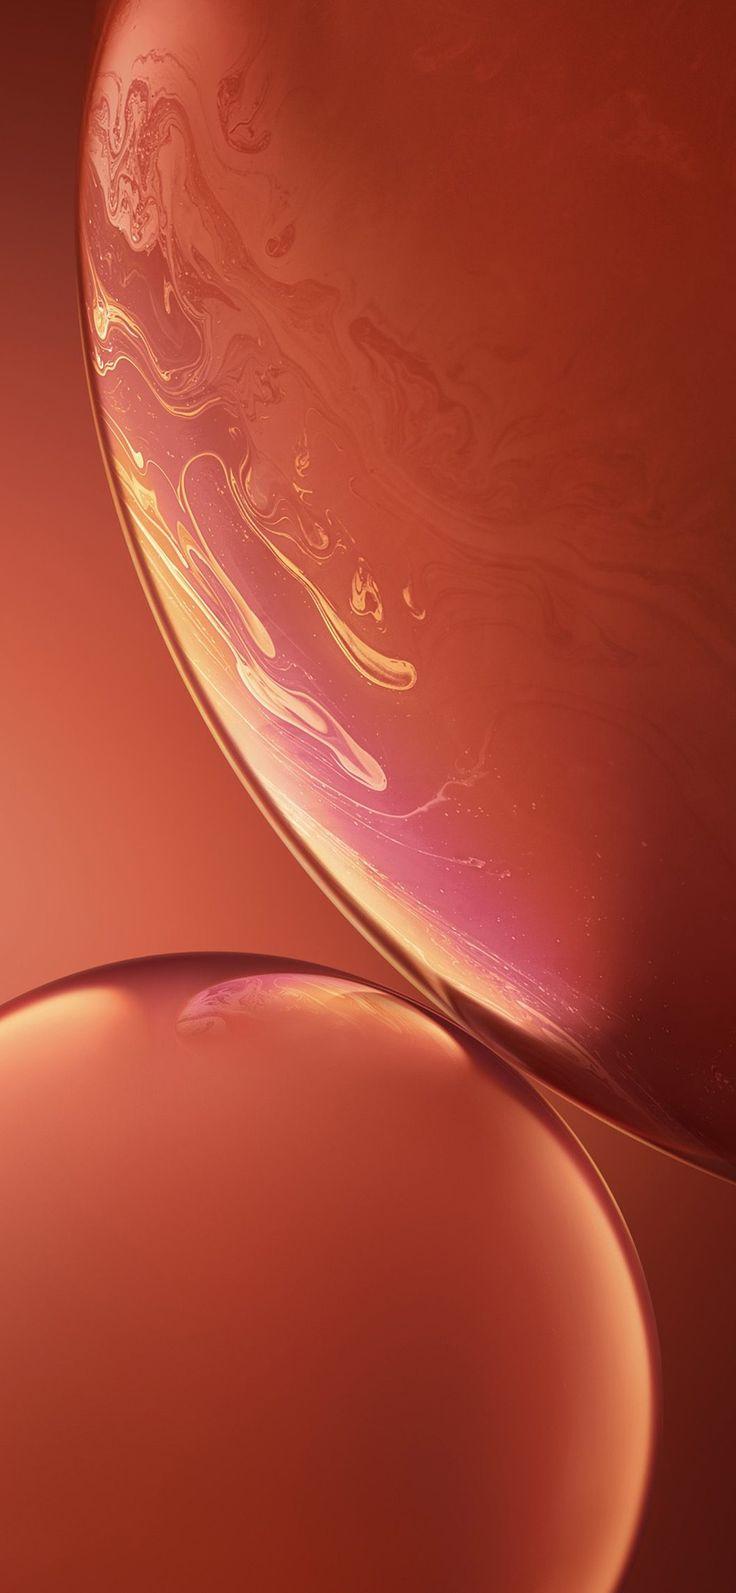 Iphone X Wallpaper Bg34 Apple Iphone Xs Red Official Art Orange